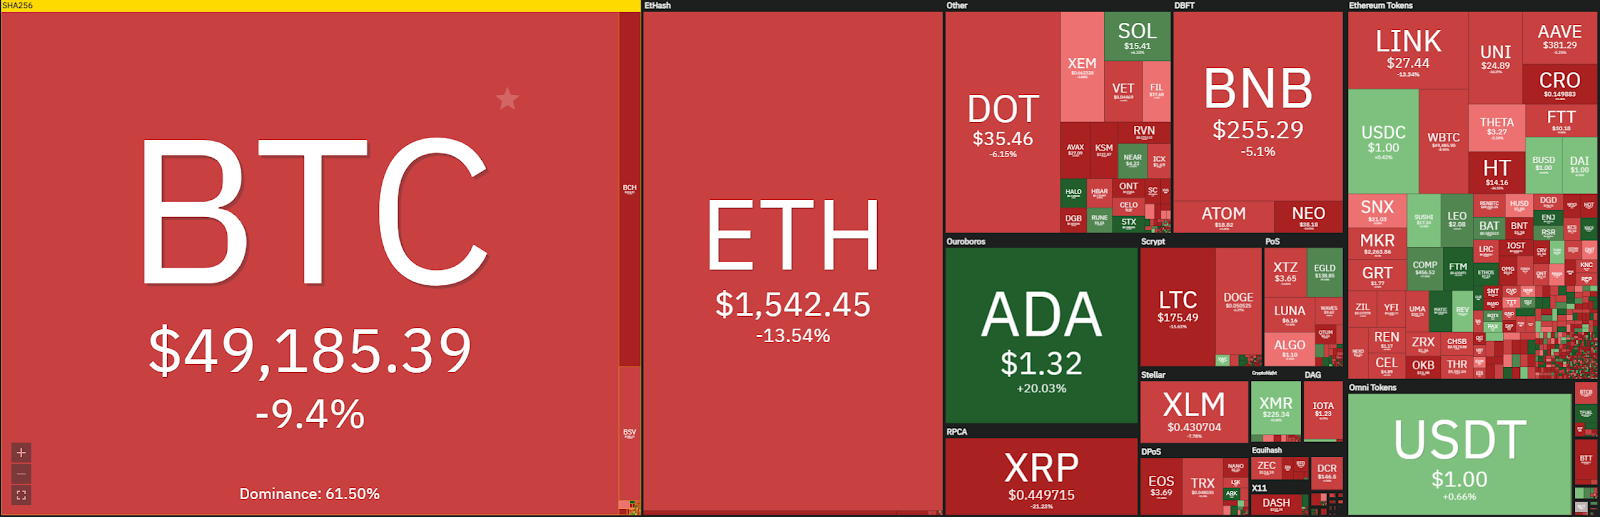 Weekly Crypto Price Analysis 1st Mar: BTC, ETH, DOT, UNI, SUSHI 1